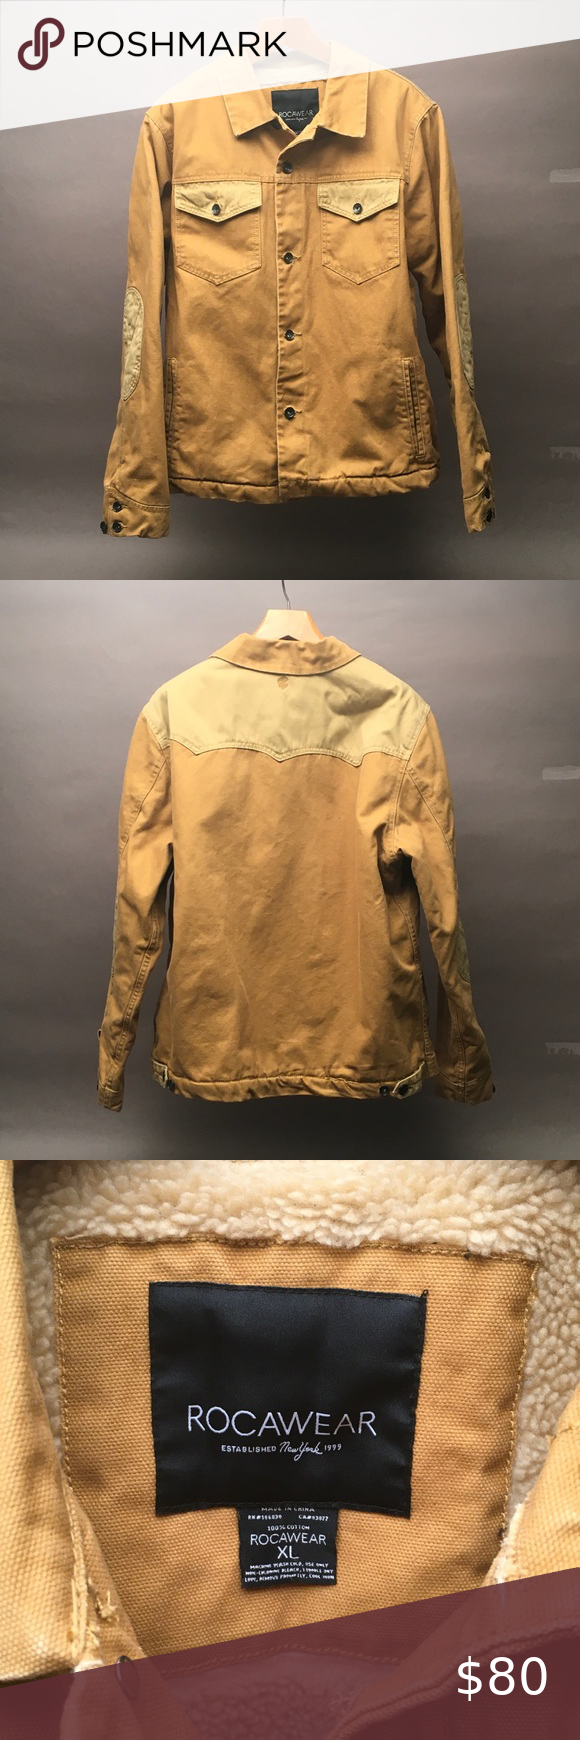 Better Than Carhartt Rocawear Nyc Coat Jacket Men Bomber Jacket Vintage Men S Coats And Jackets Vintage Denim Jacket [ 1740 x 580 Pixel ]